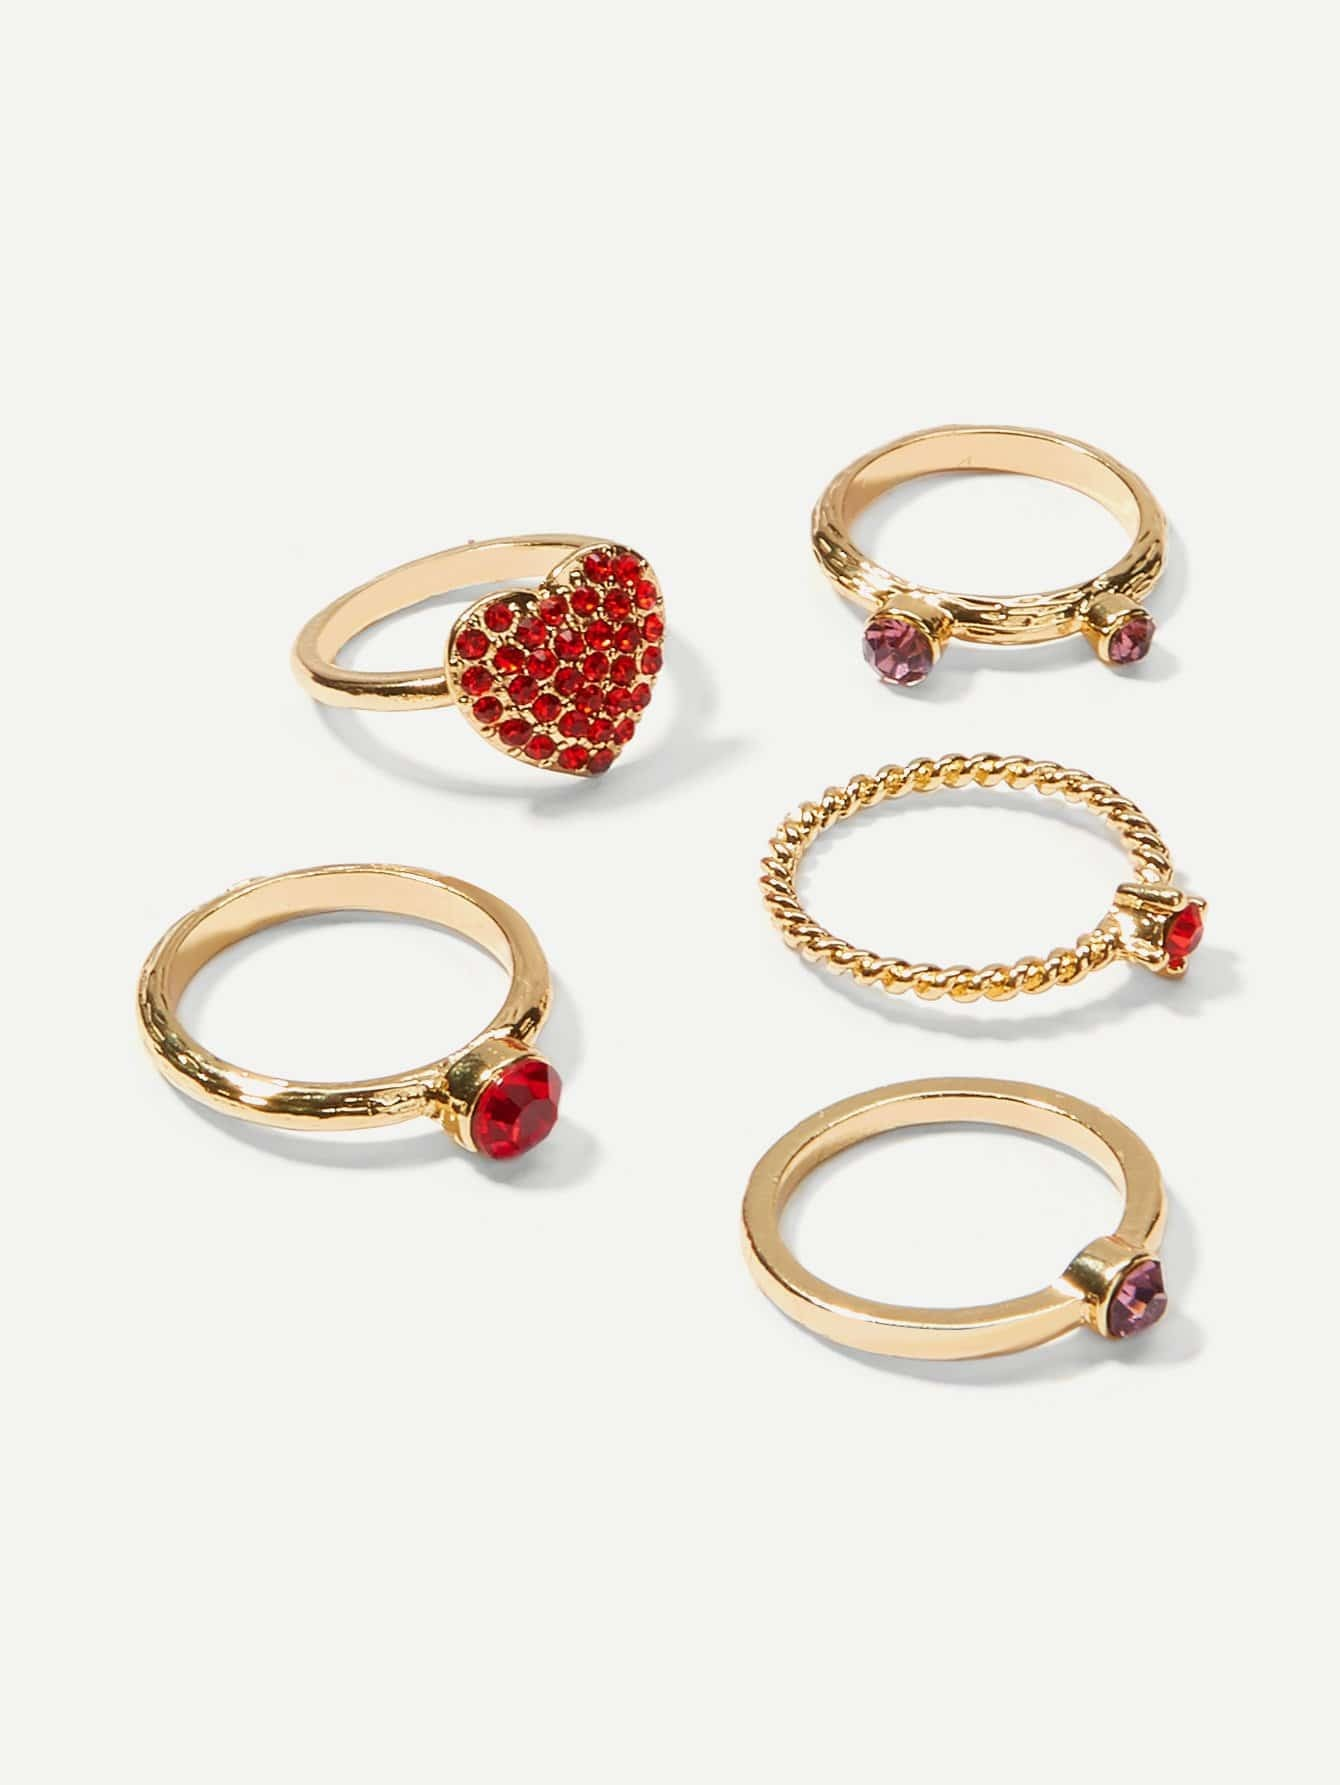 Heart Design Rhinestone Rings Set 5pcs 4pcs sweet rhinestone openwork heart design rings for women